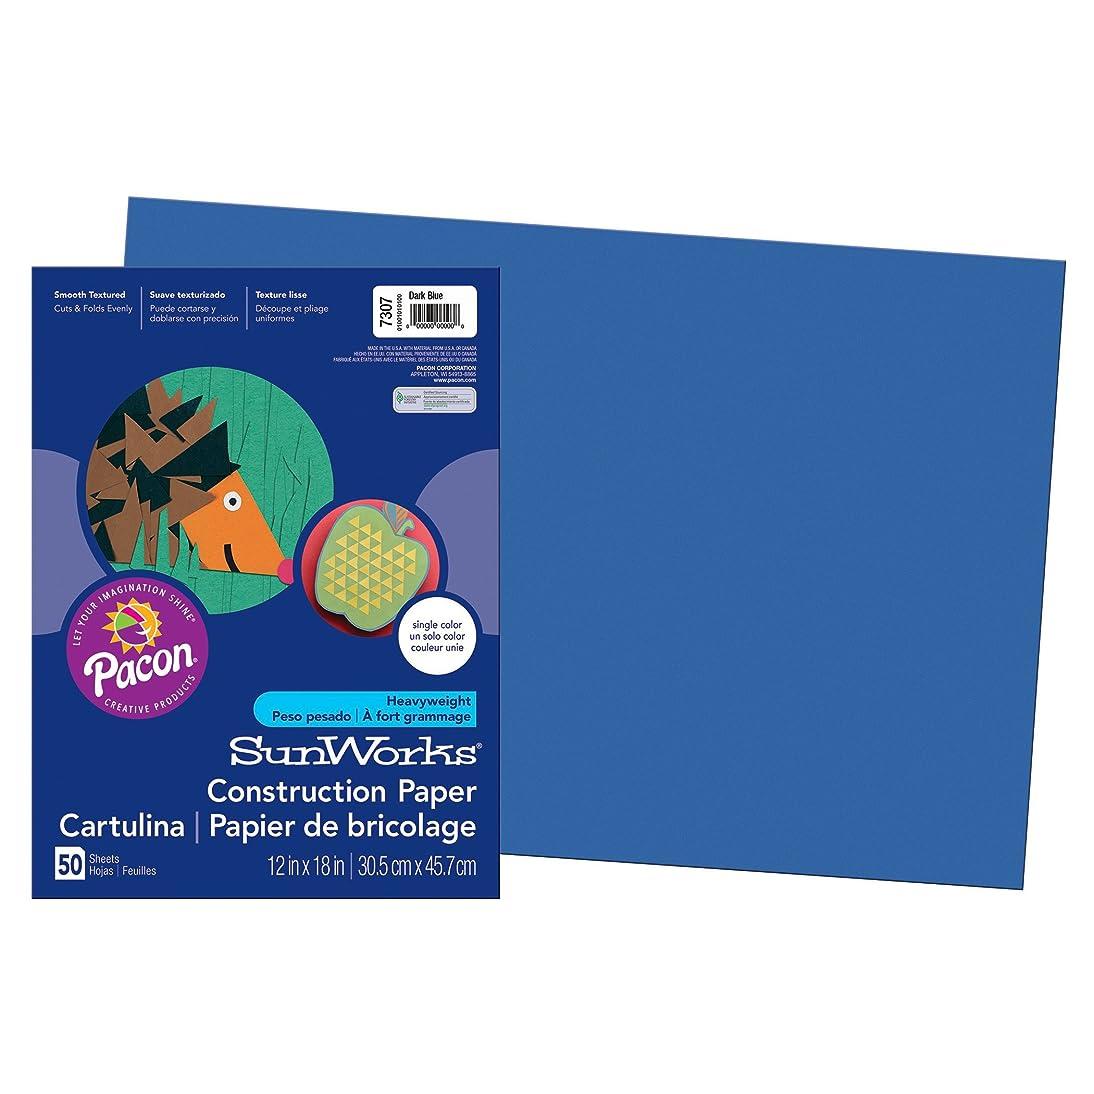 Pacon PAC7307 SunWorks Construction Paper, 12